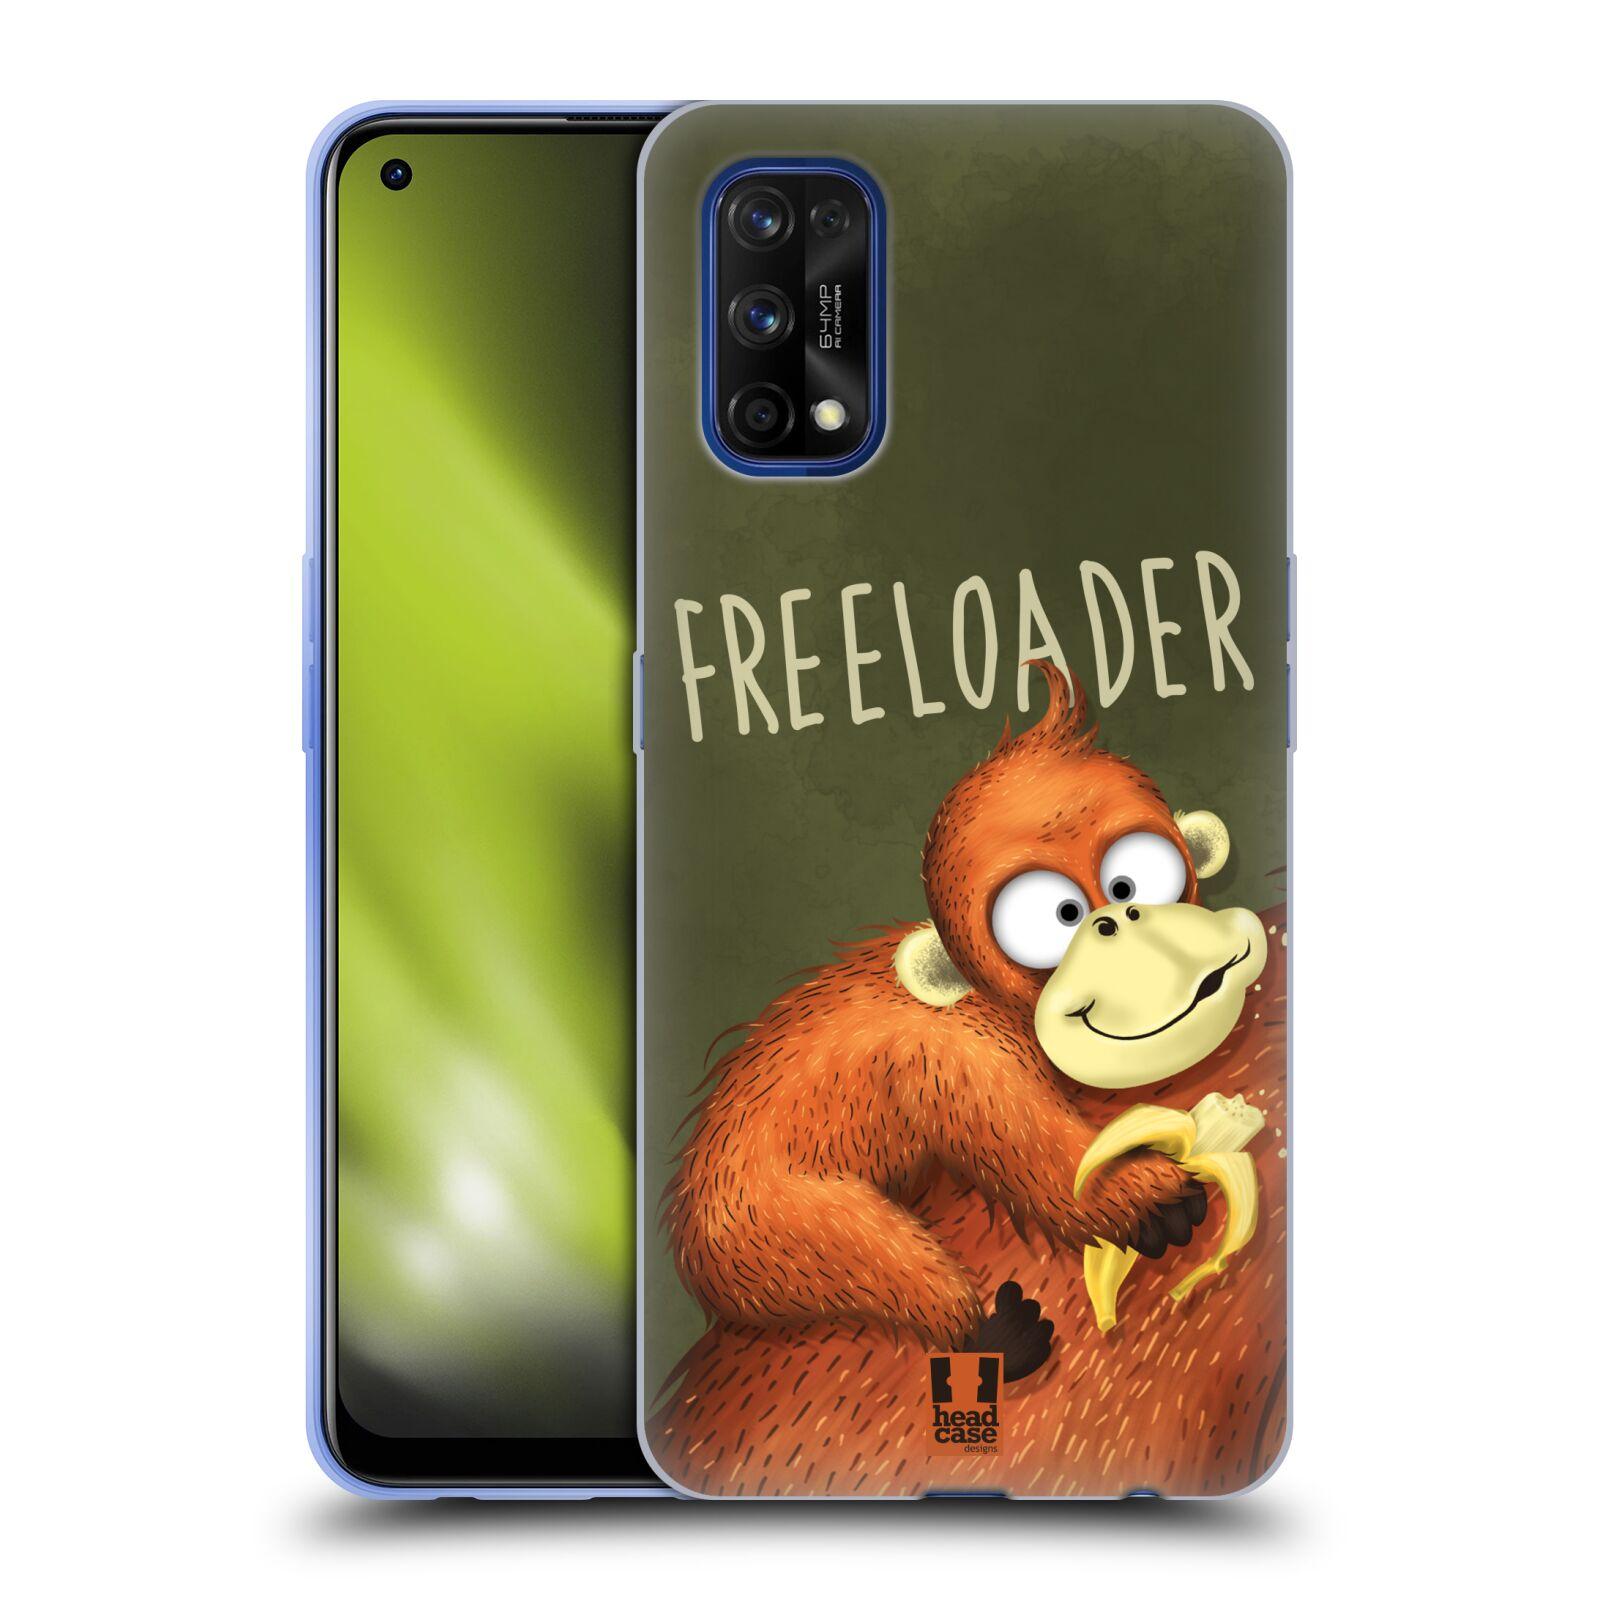 Silikonové pouzdro na mobil Realme 7 Pro - Head Case - Opičák Freeloader